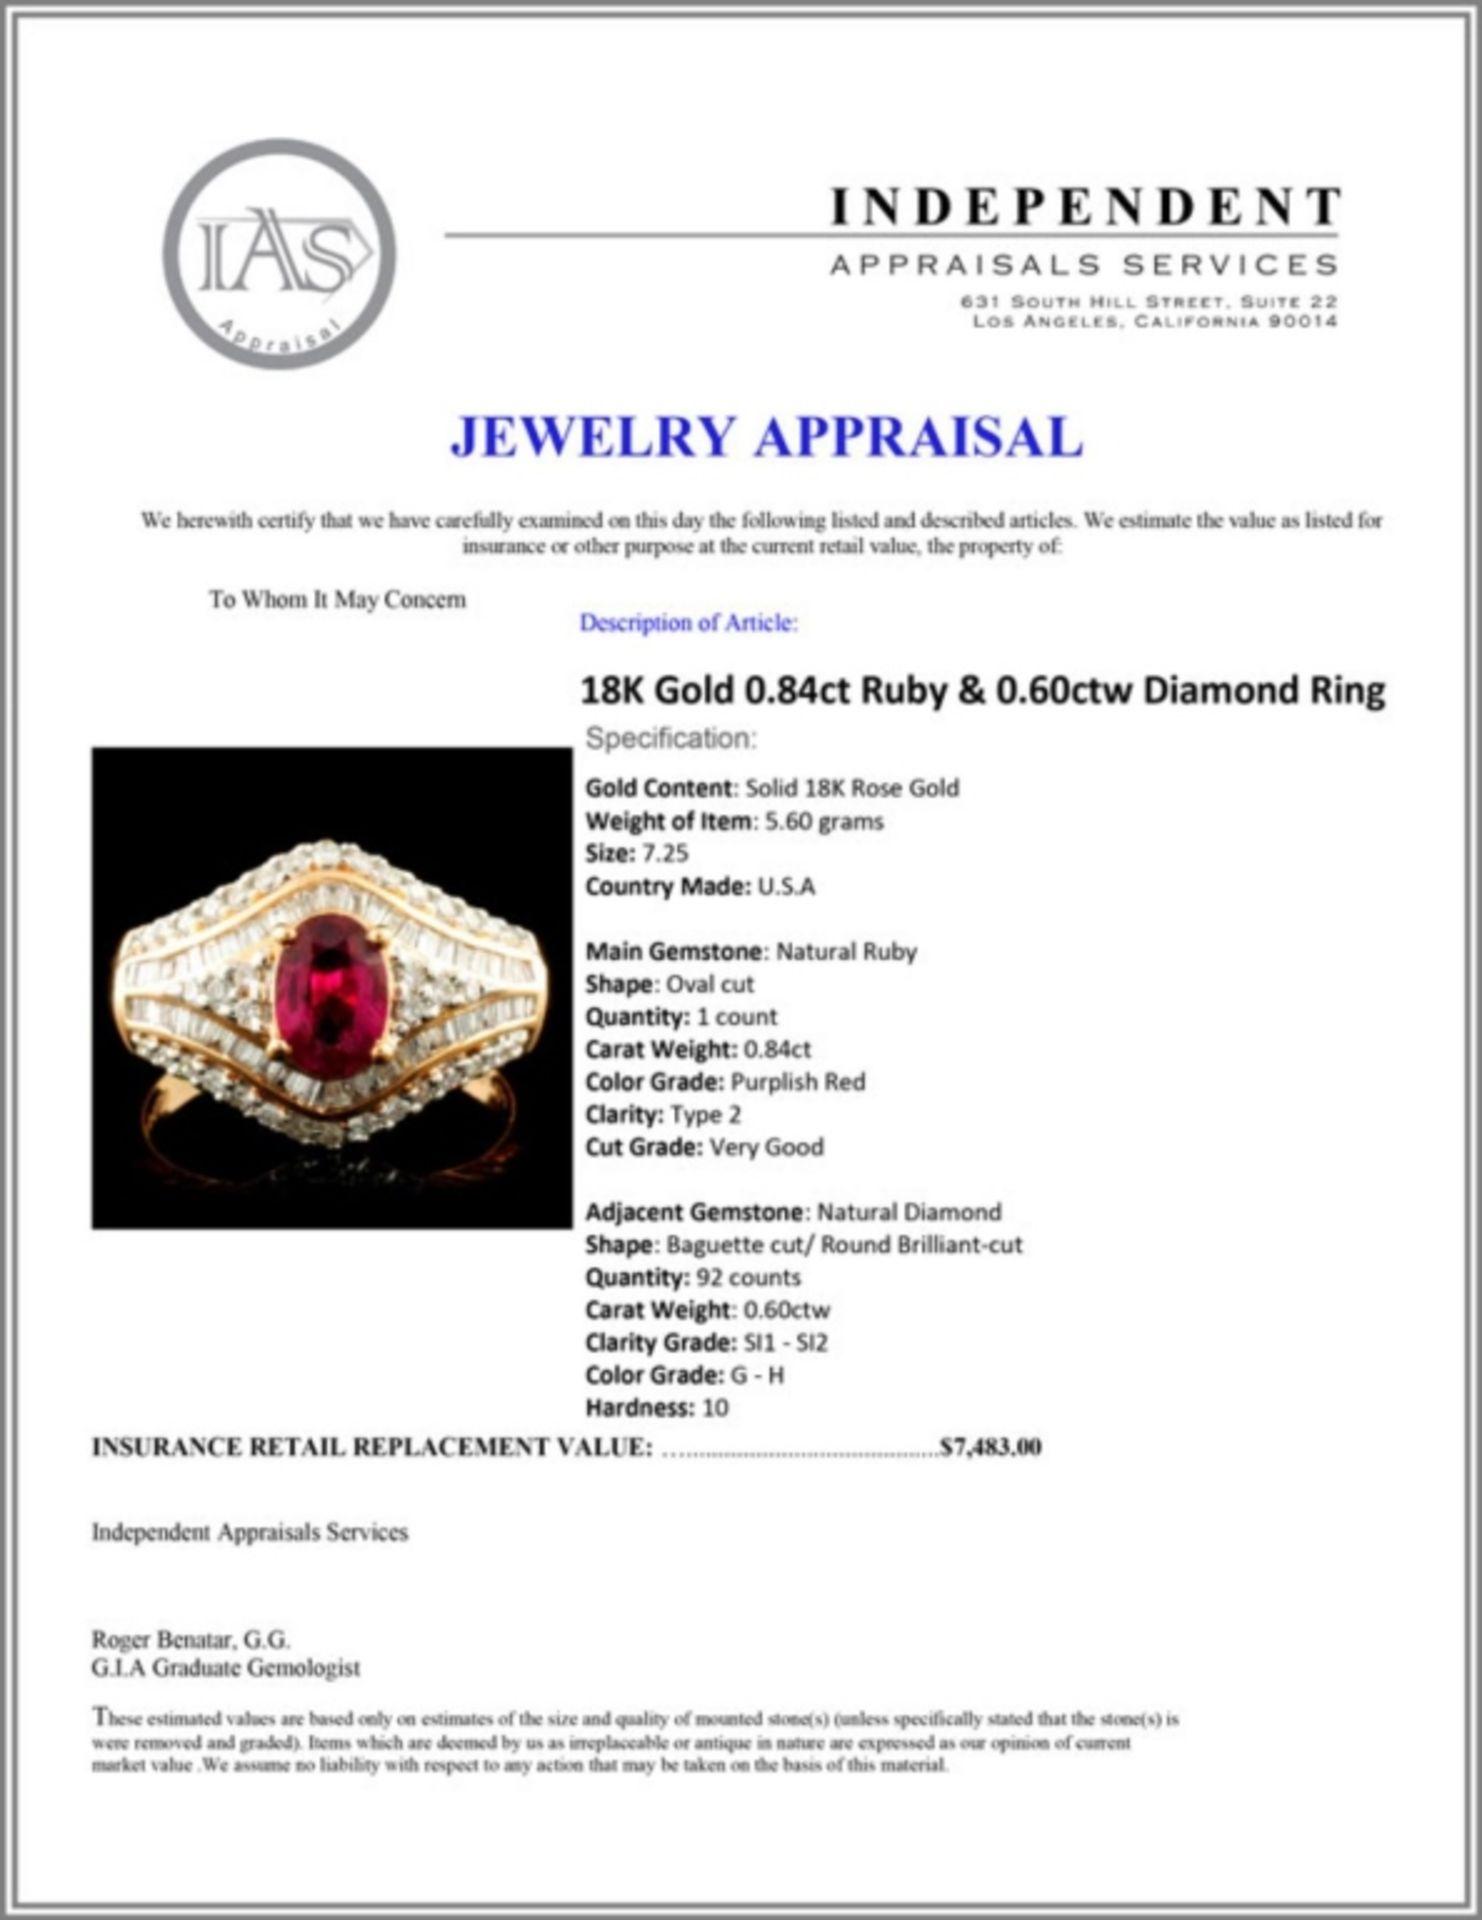 18K Gold 0.84ct Ruby & 0.60ctw Diamond Ring - Image 5 of 5